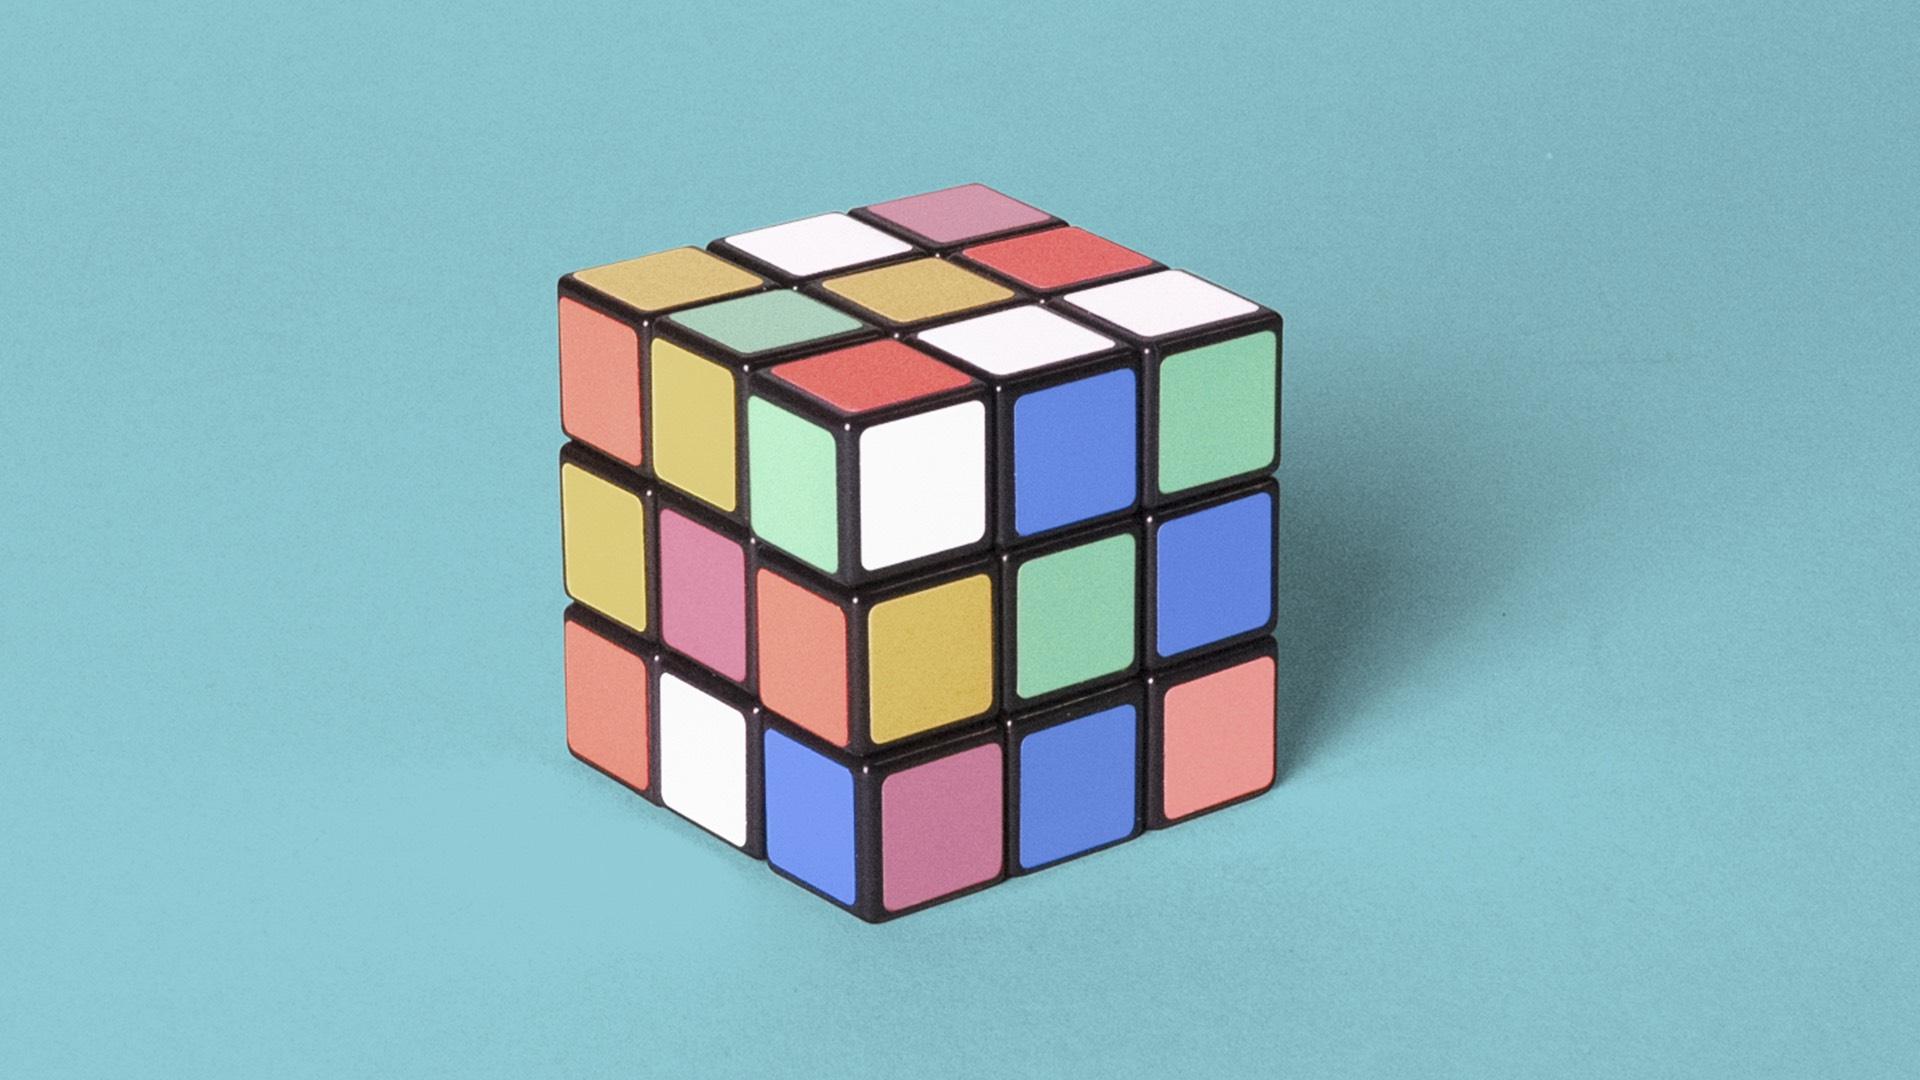 Station_SOME_Rubiks